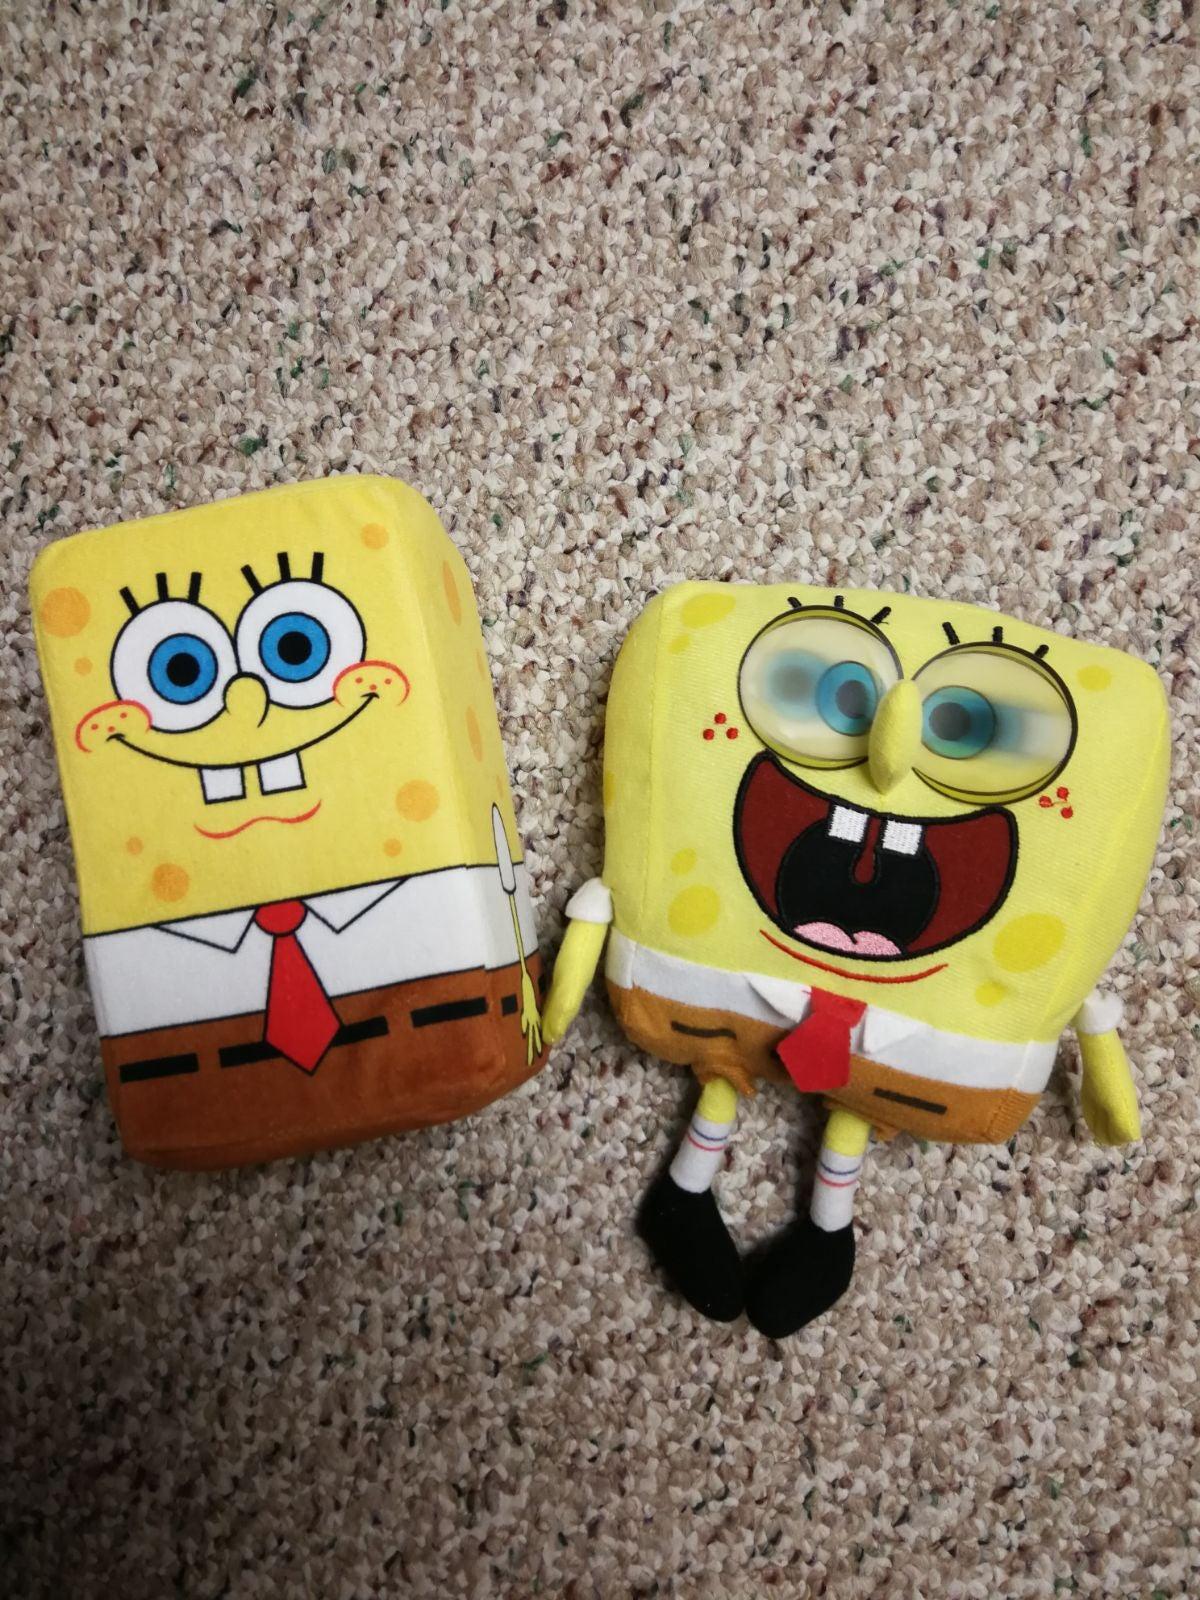 Spongebob plush toys